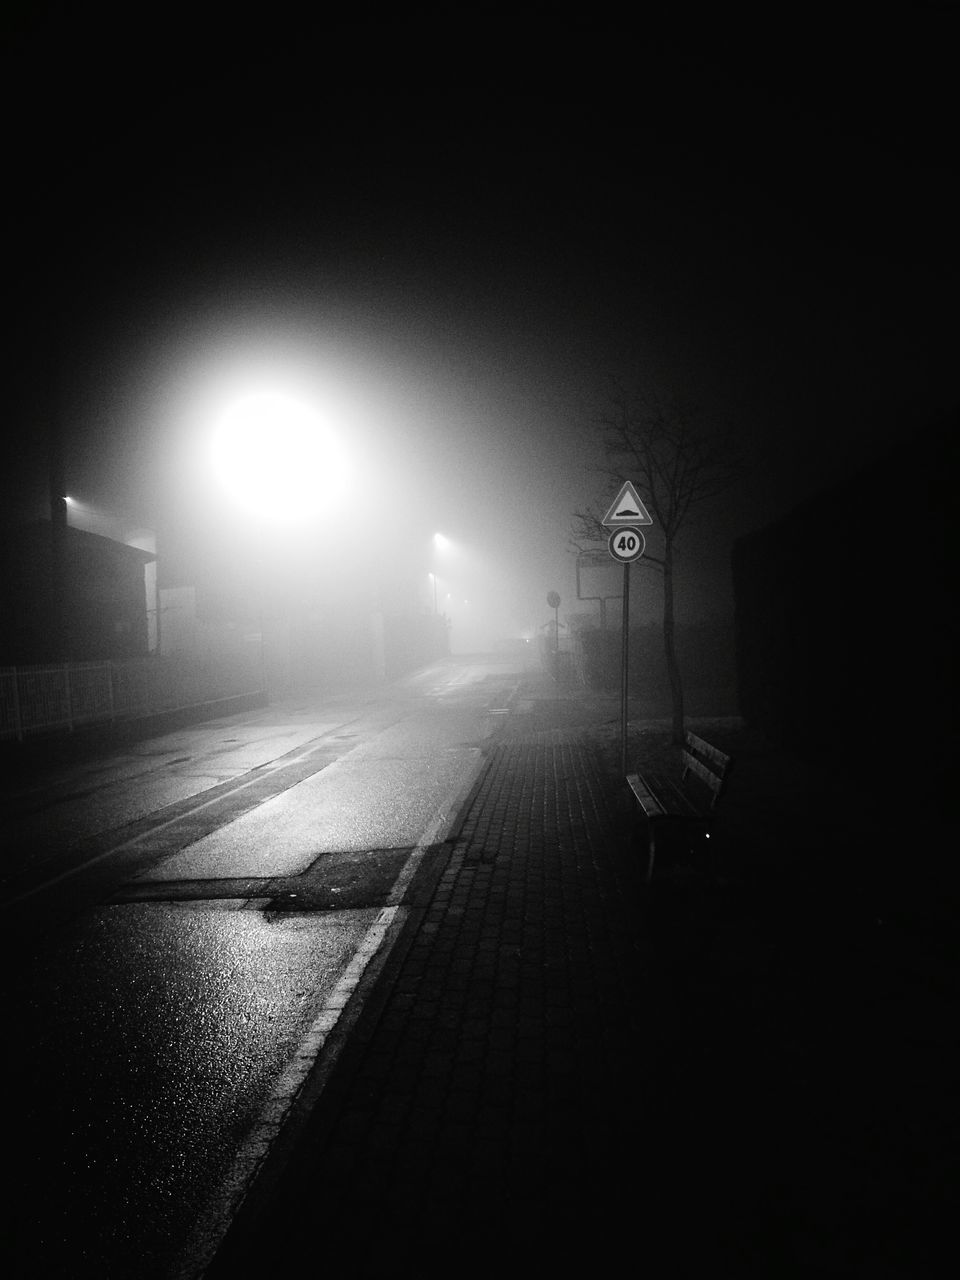 night, illuminated, lighting equipment, street light, transportation, outdoors, no people, sky